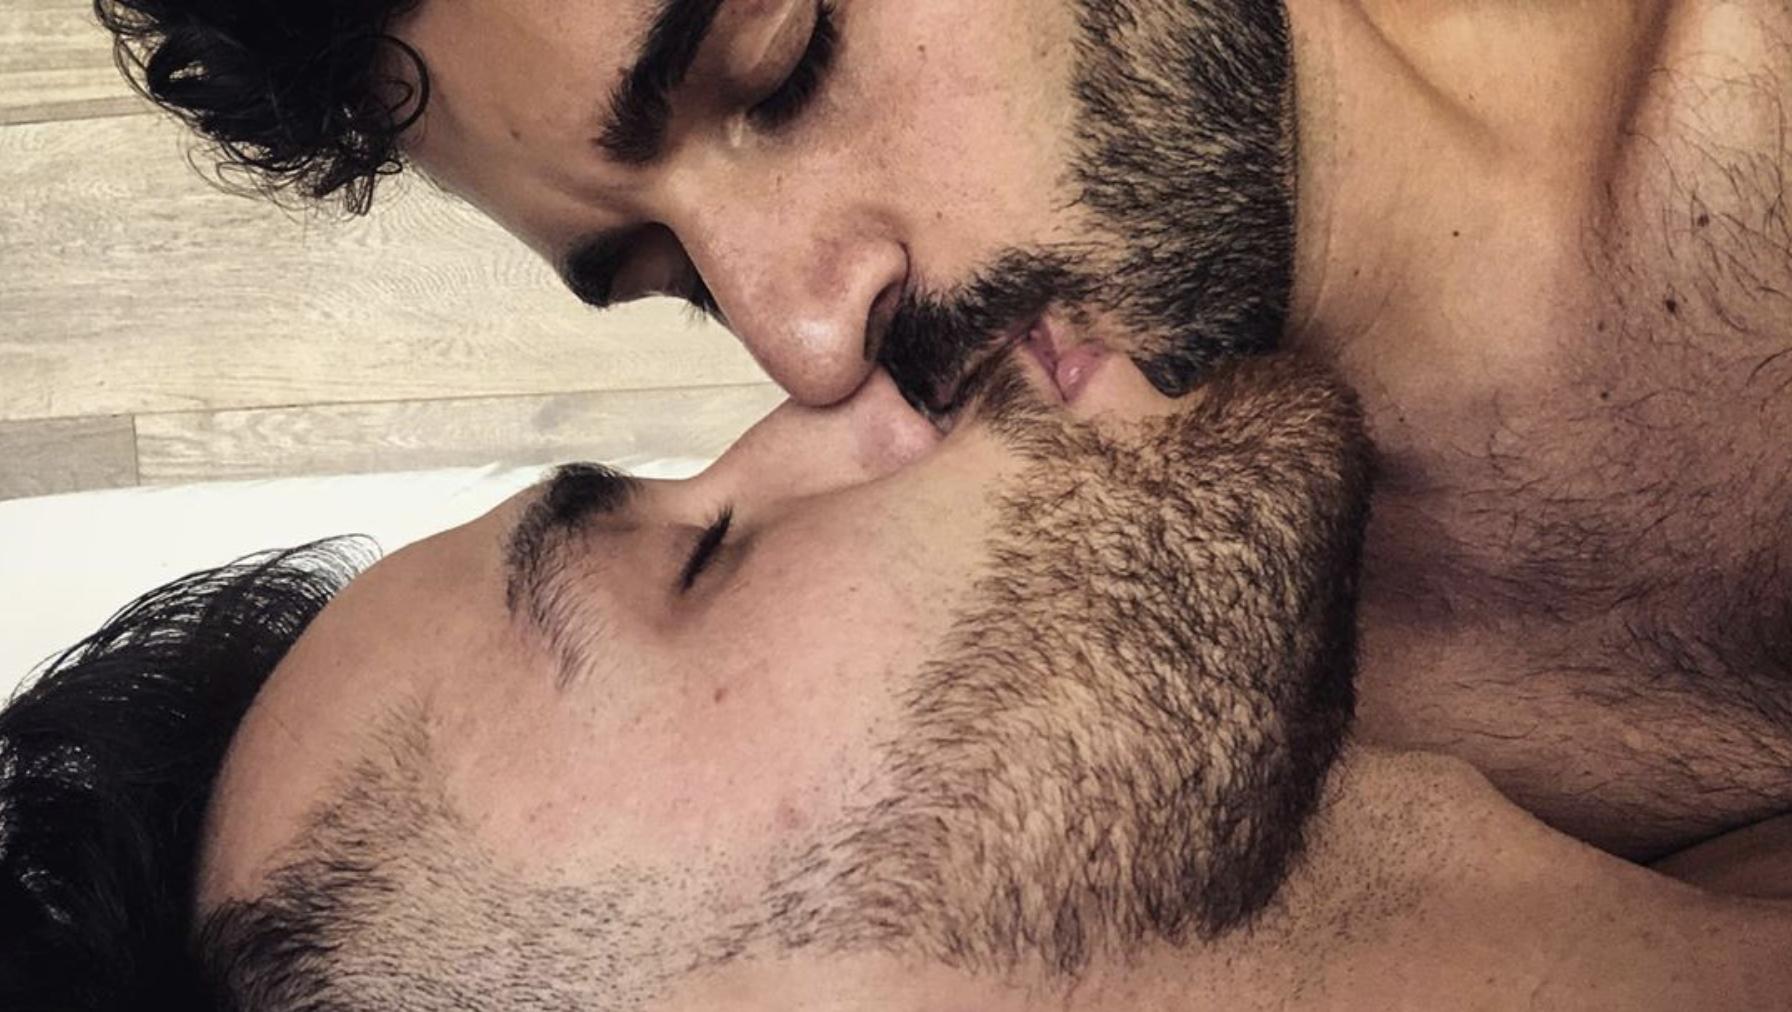 IG kriistianfer / Kiss / Gay